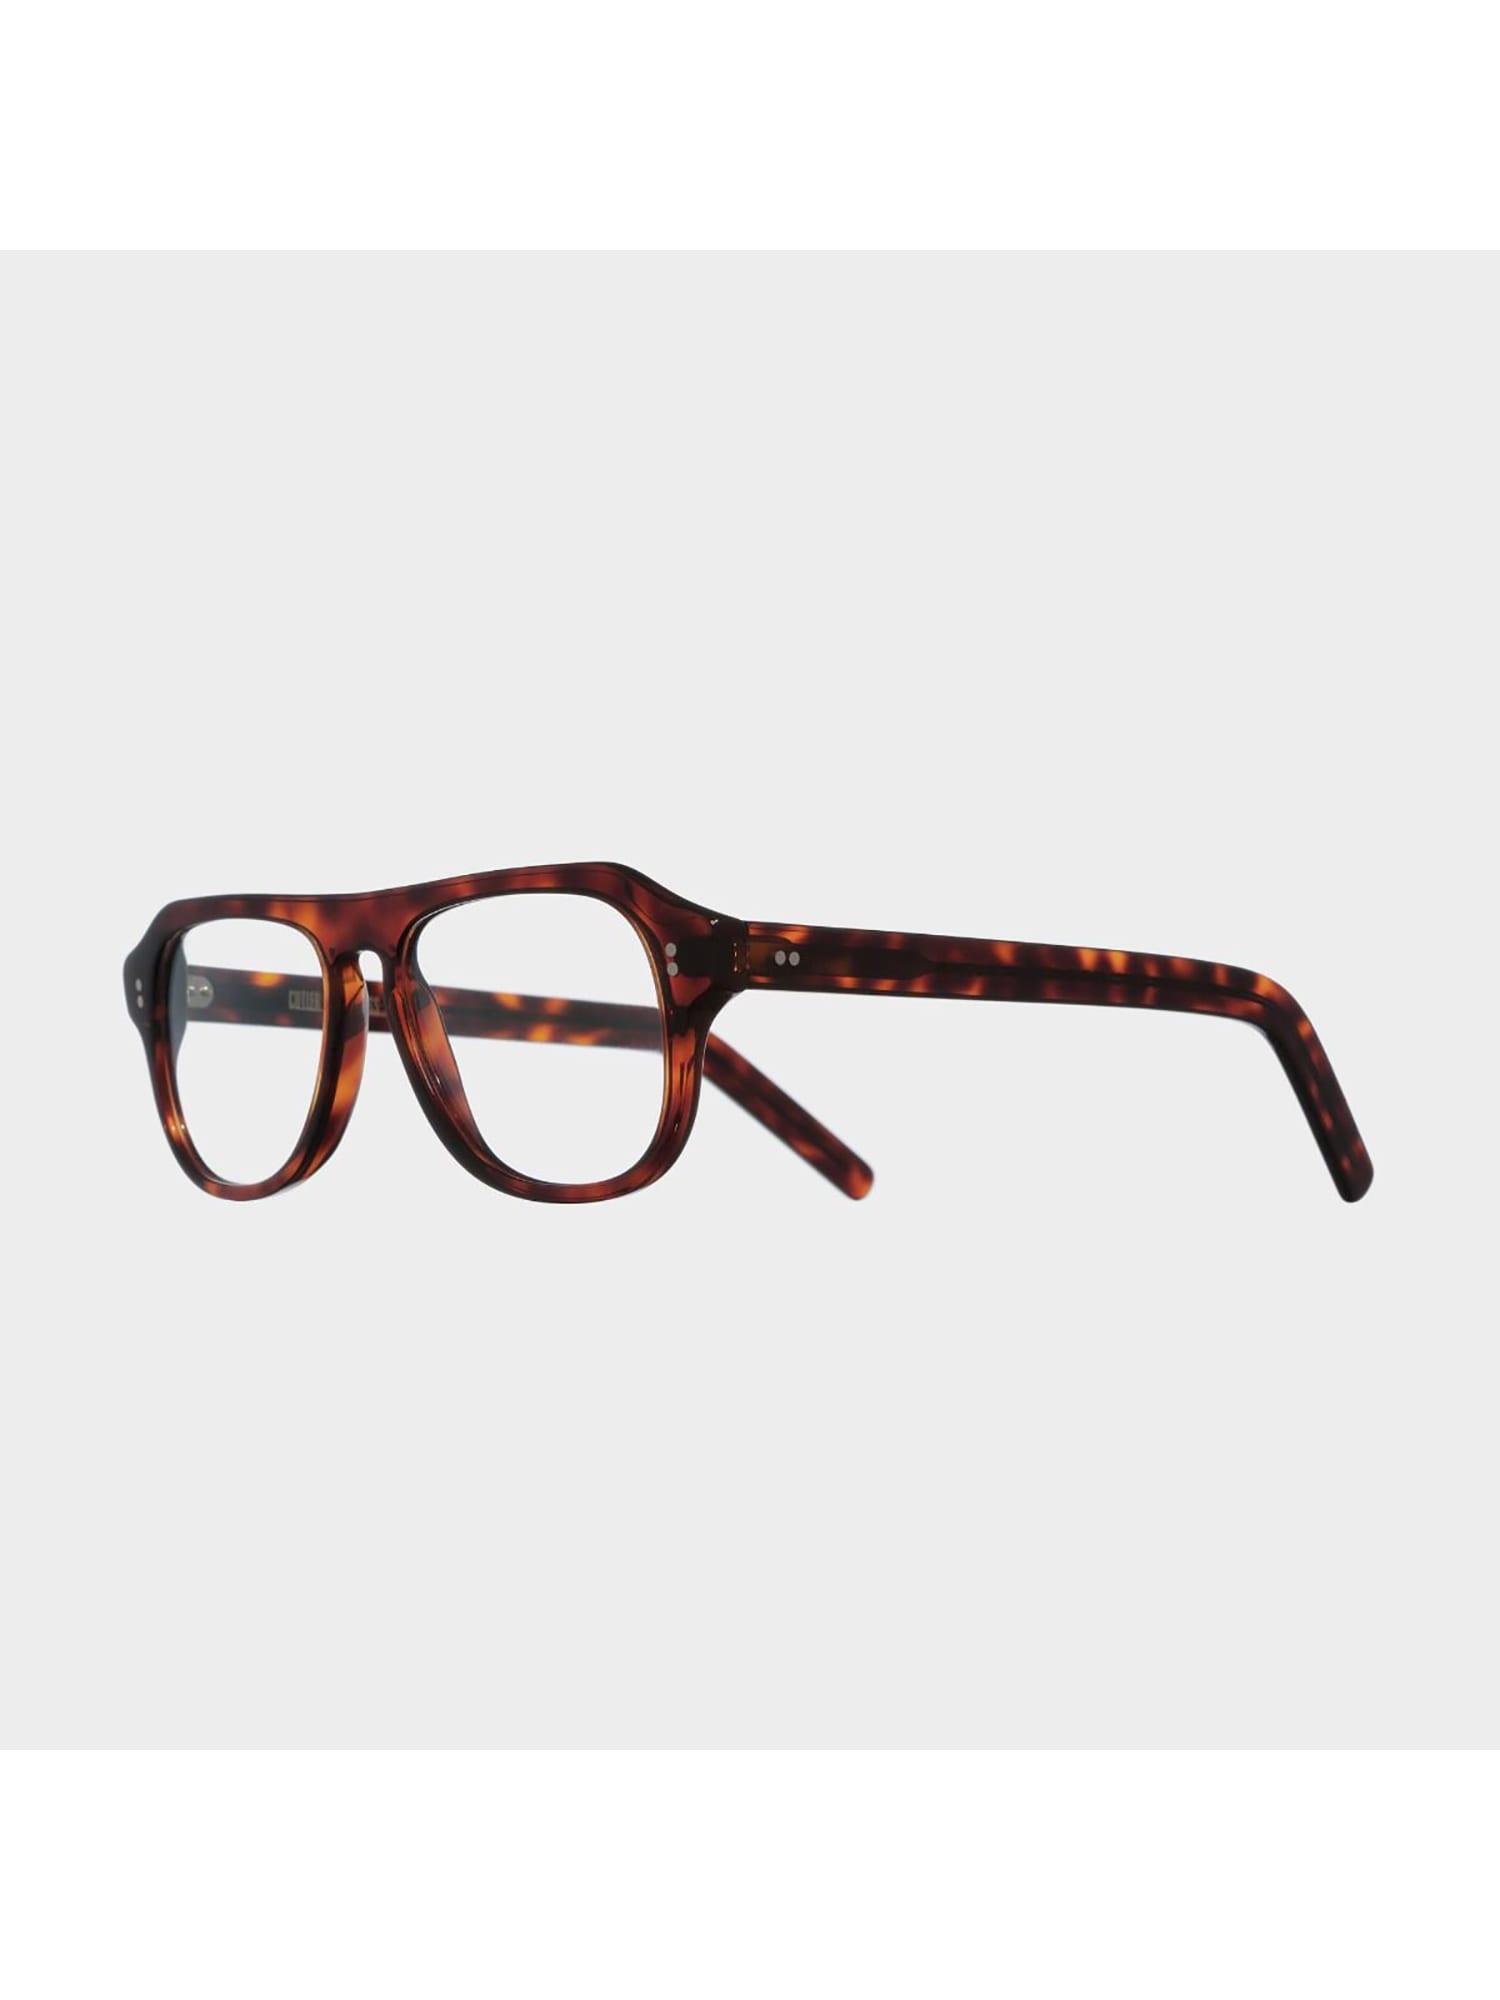 0822/2DT01 Eyewear